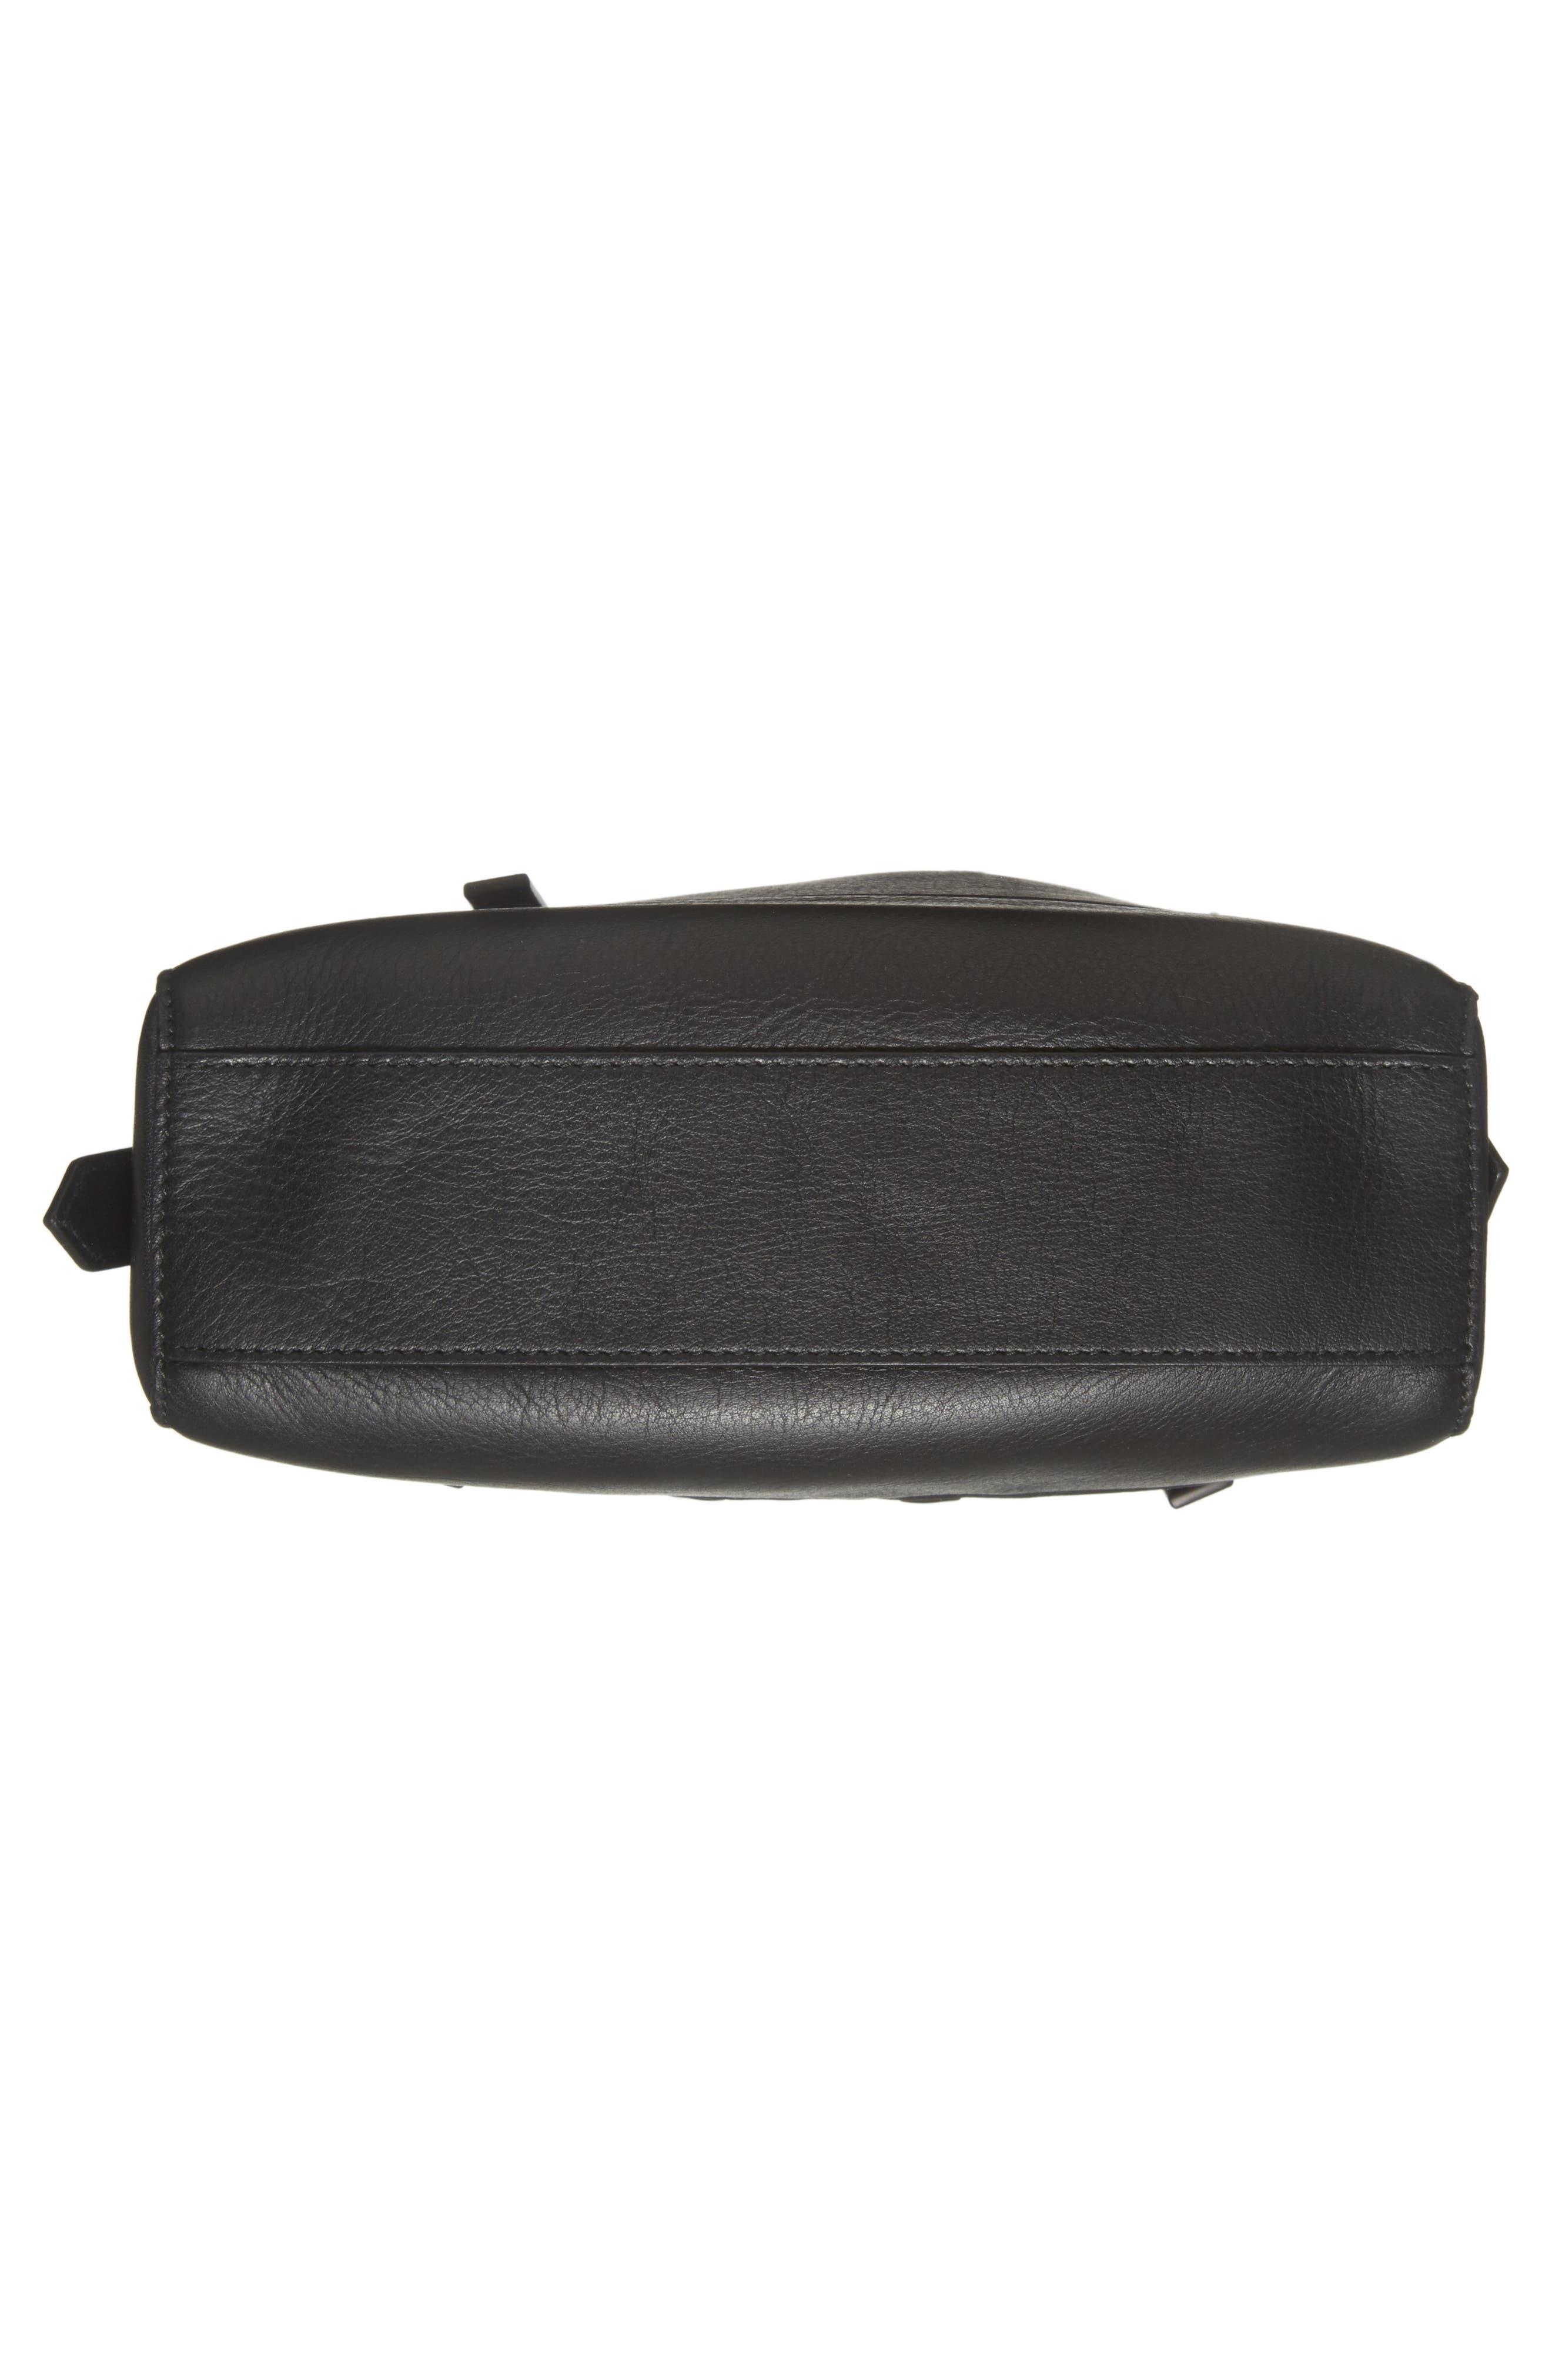 Mini Kalifornia Leather Shoulder Bag,                             Alternate thumbnail 6, color,                             001